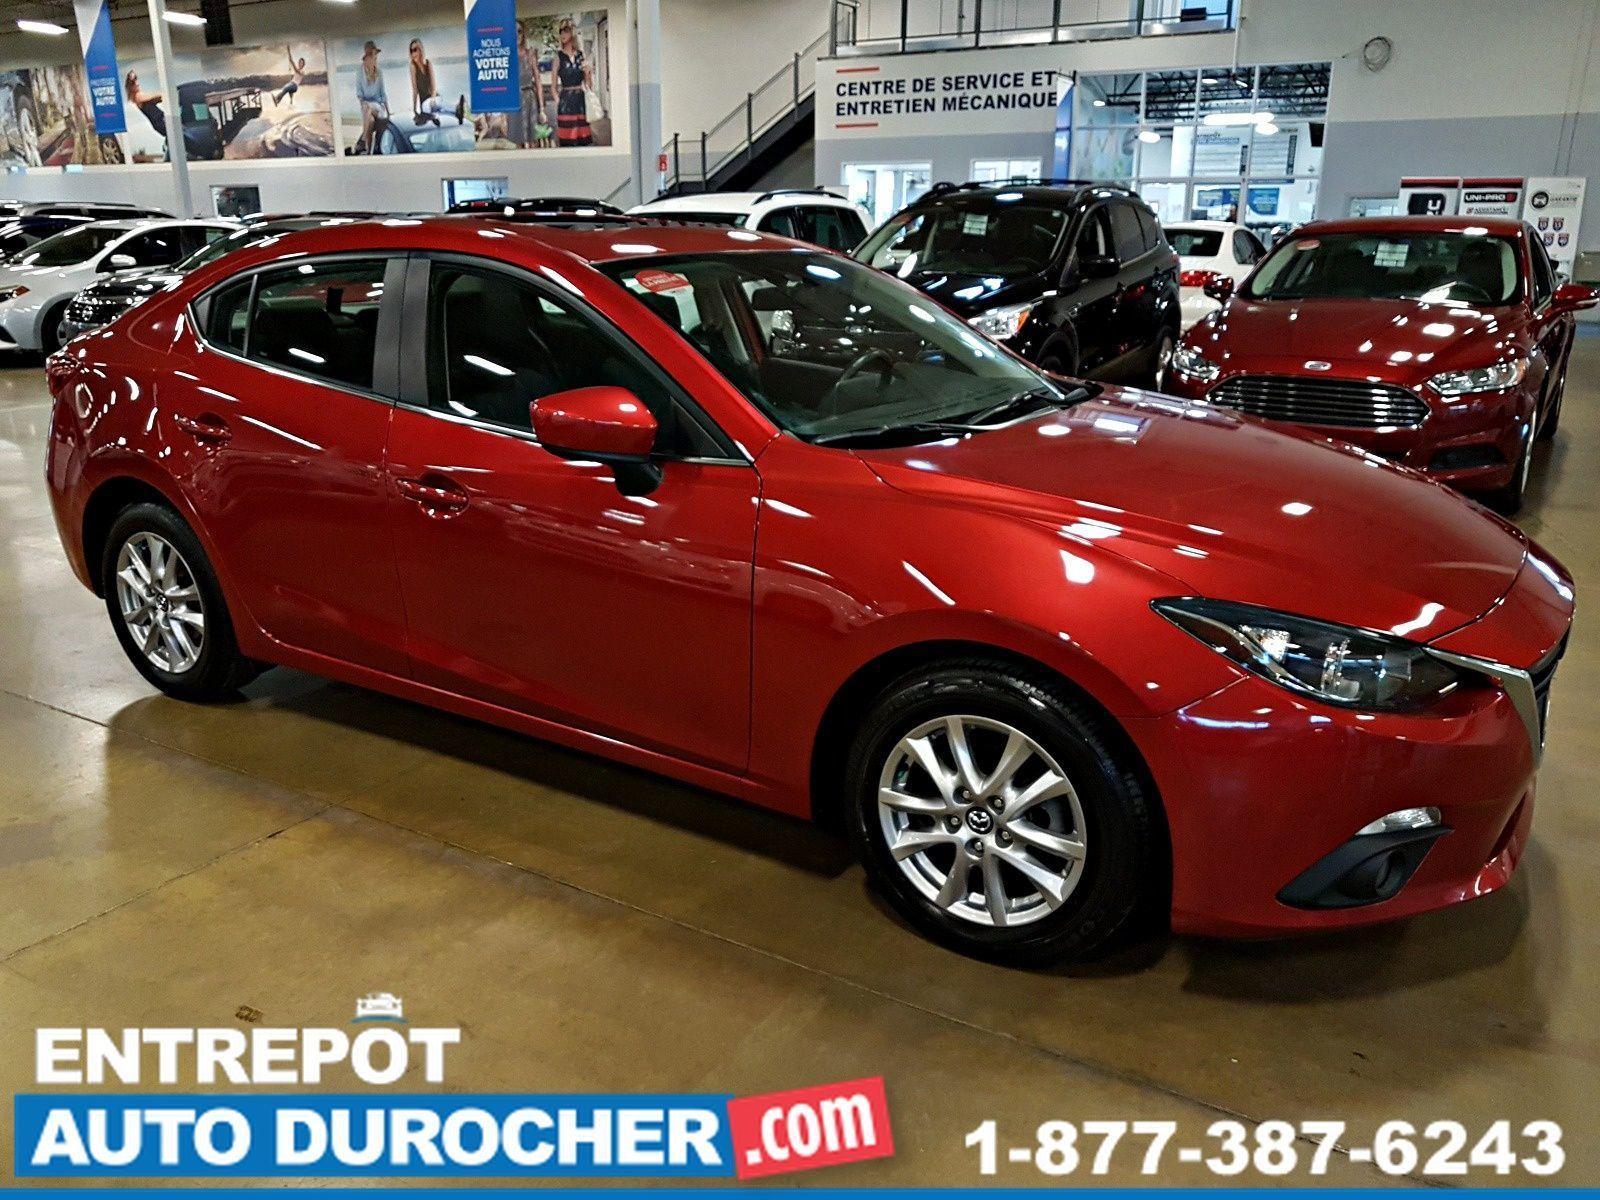 2014 Mazda Mazda3 GS-SKY  Automatique - TOIT OUVRANT - Air Climatisé